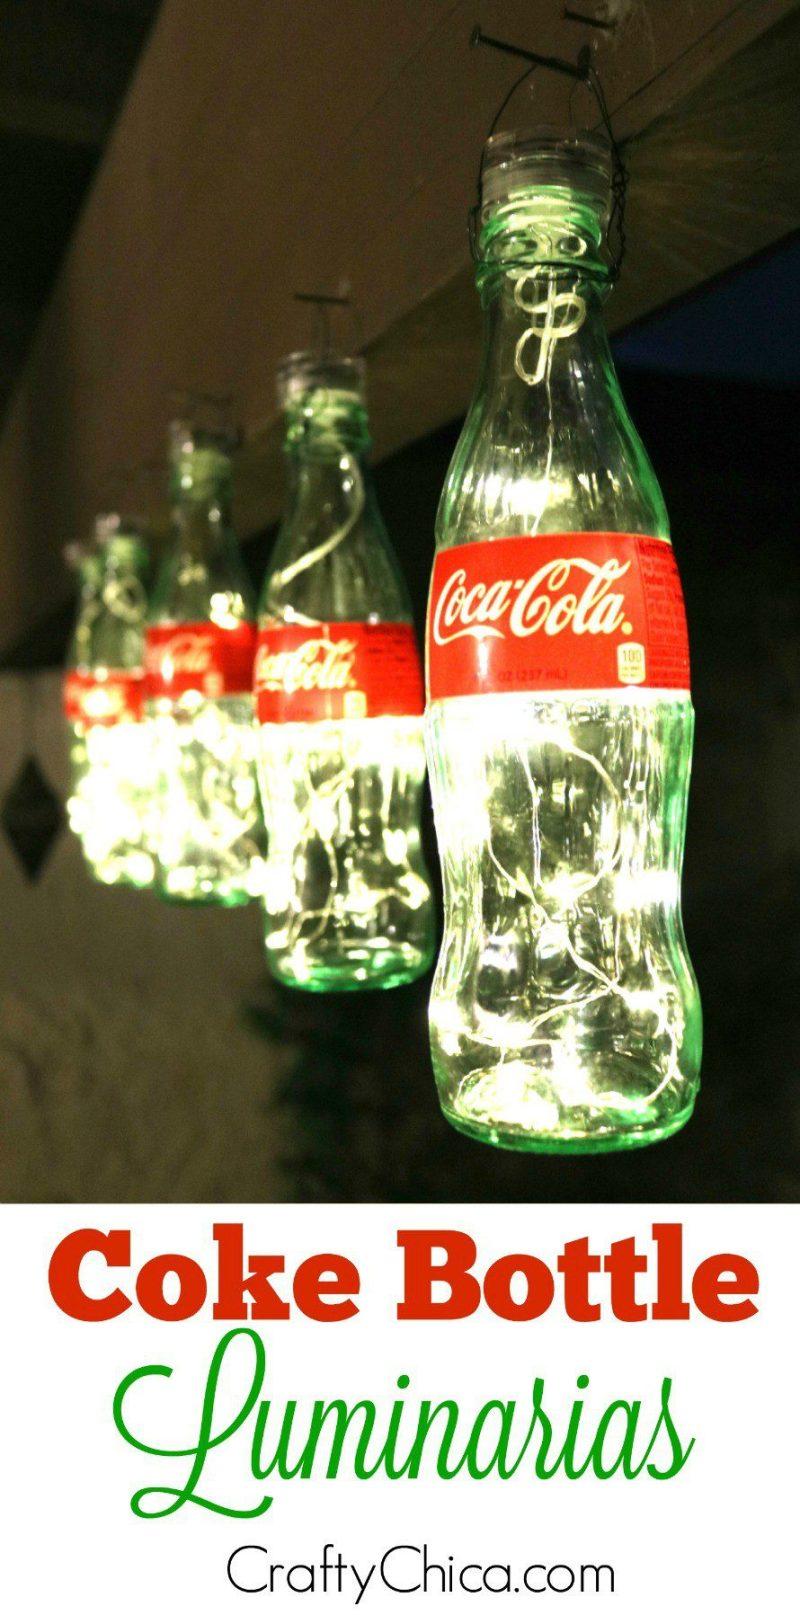 Coke-Bottle-Luminarias890a